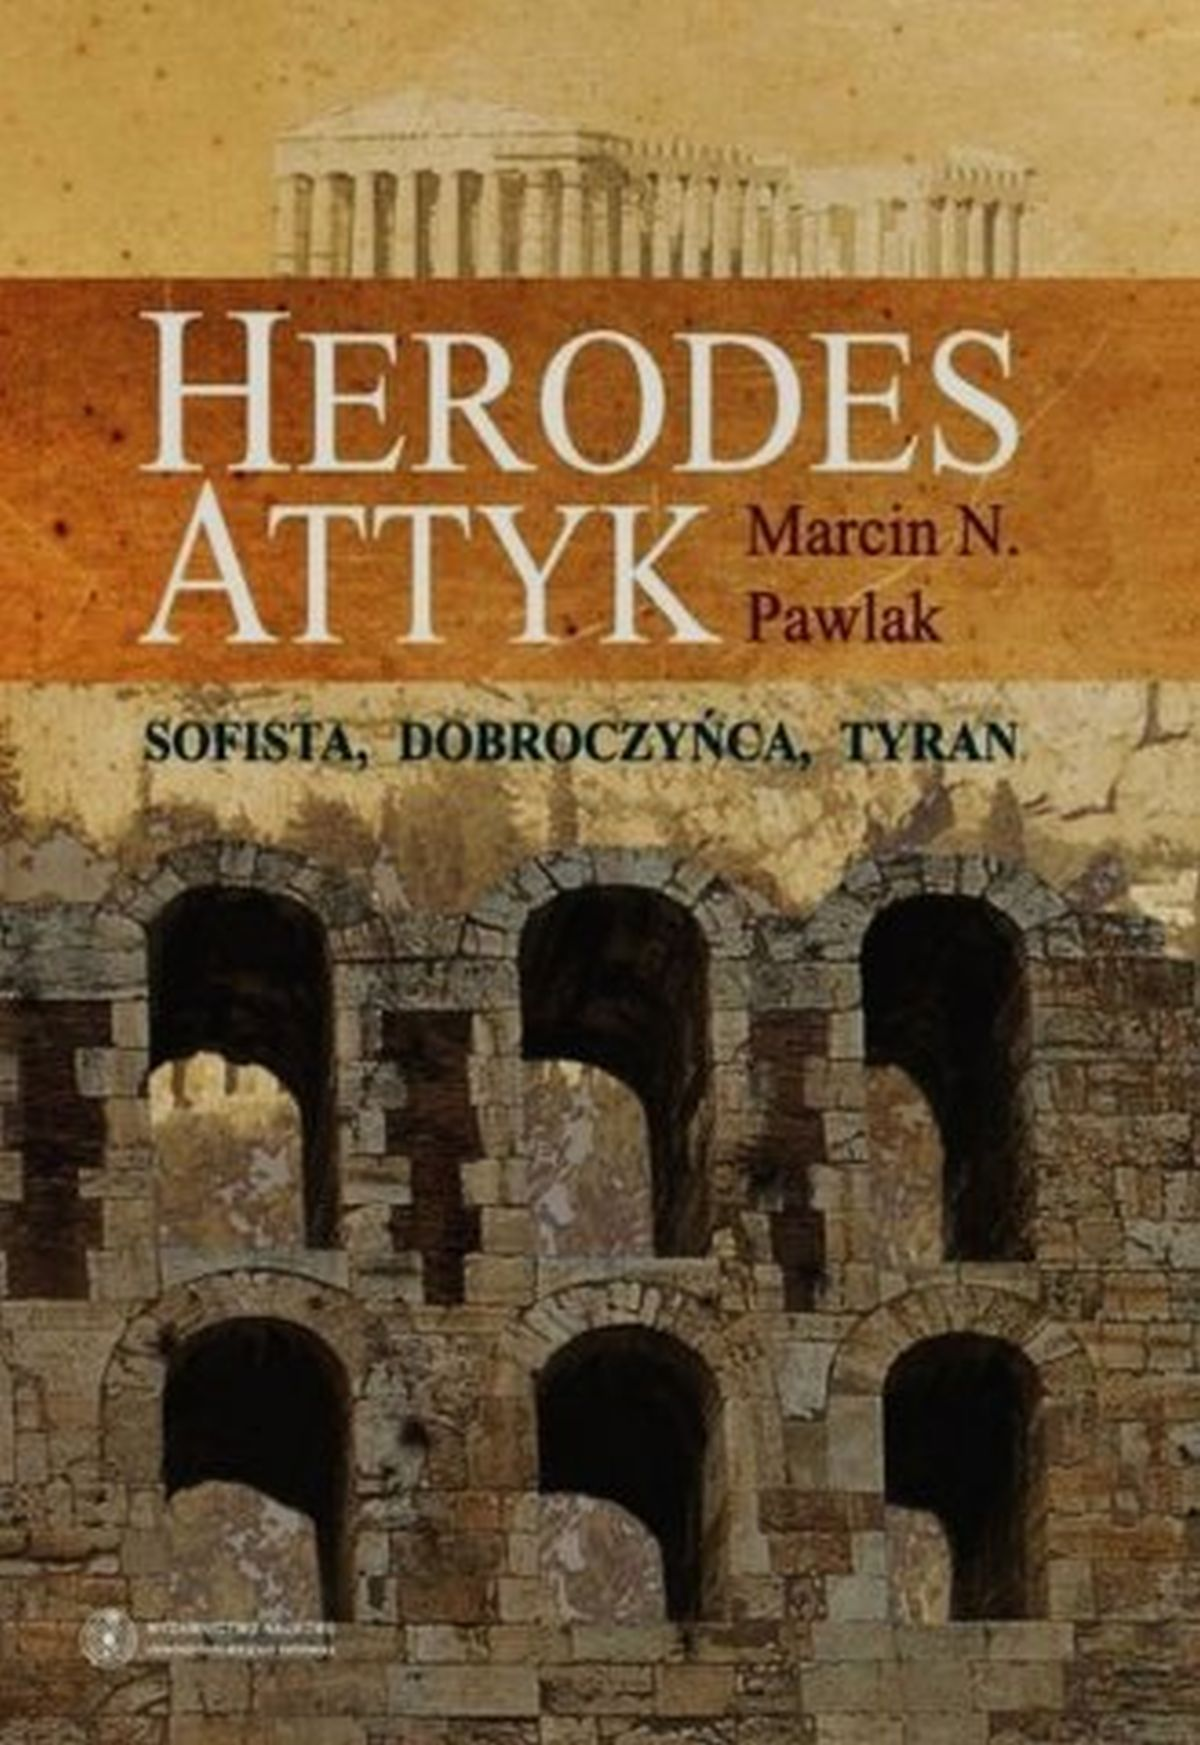 Marcin N. Pawlak, Herodes Attyk. Sofista, dobroczyńca